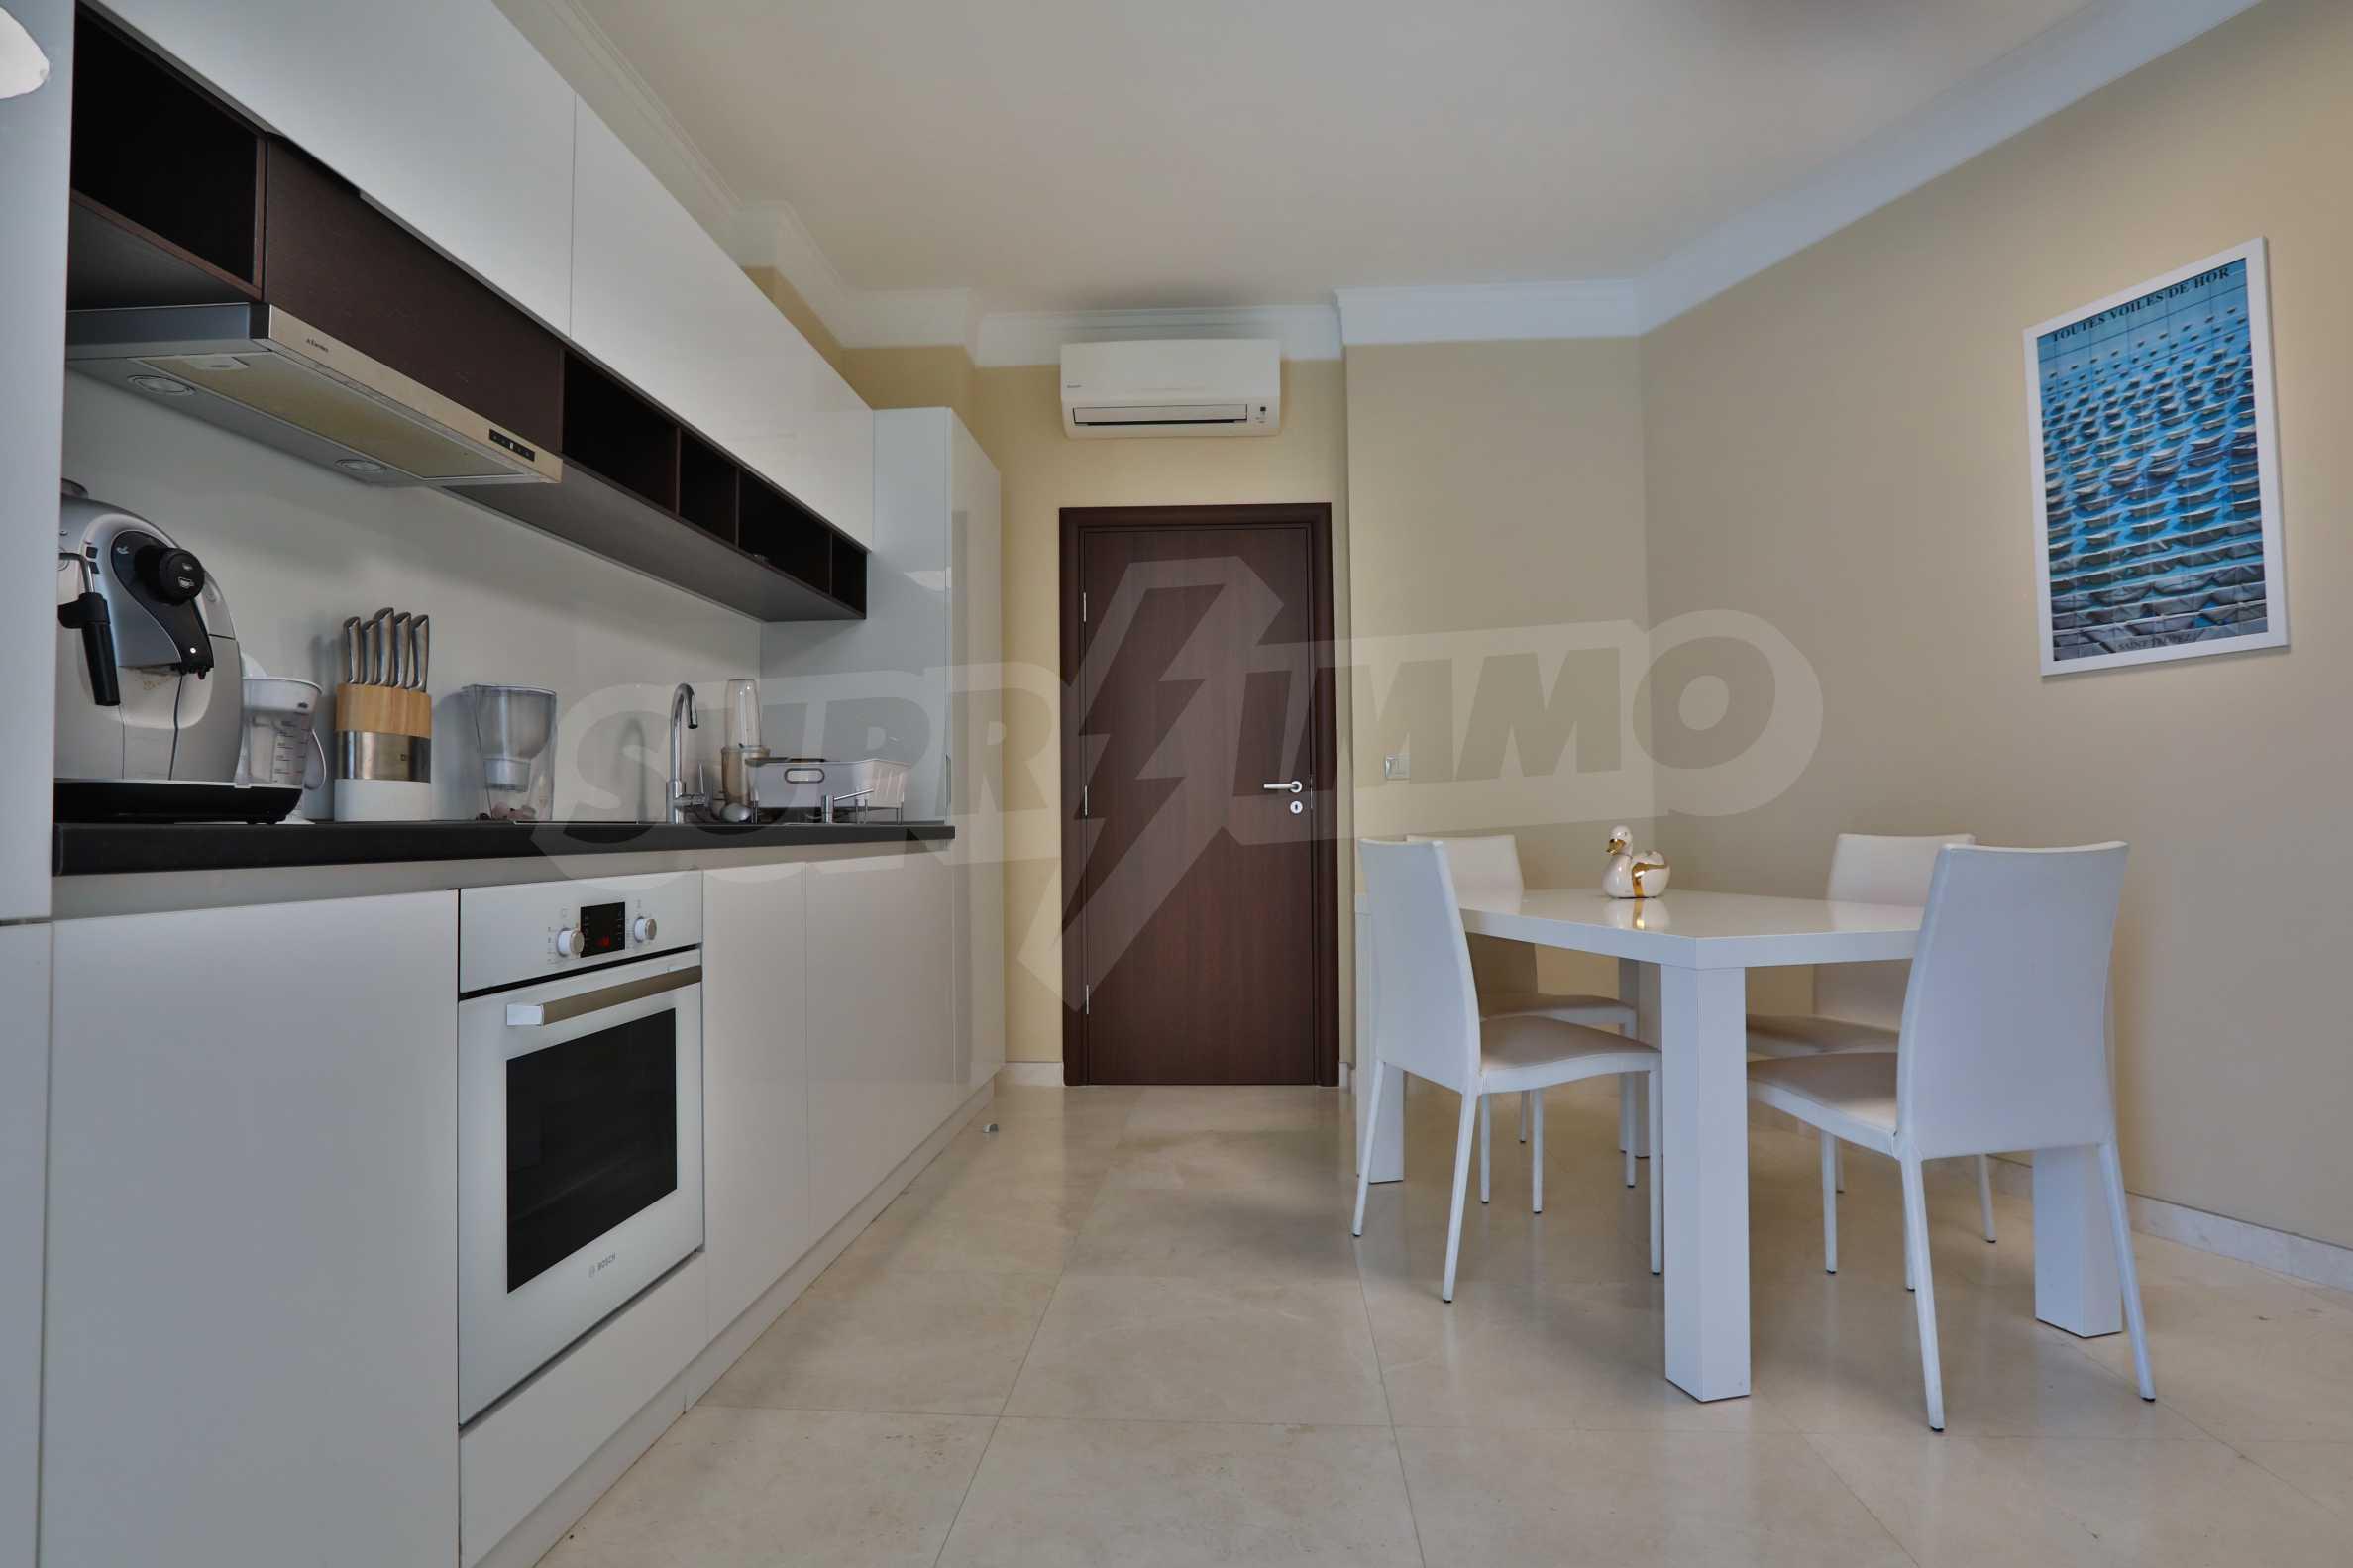 Exclusive 2-bedroom beachfront apartment in the prestigious Belle Époque Beach Residence 12